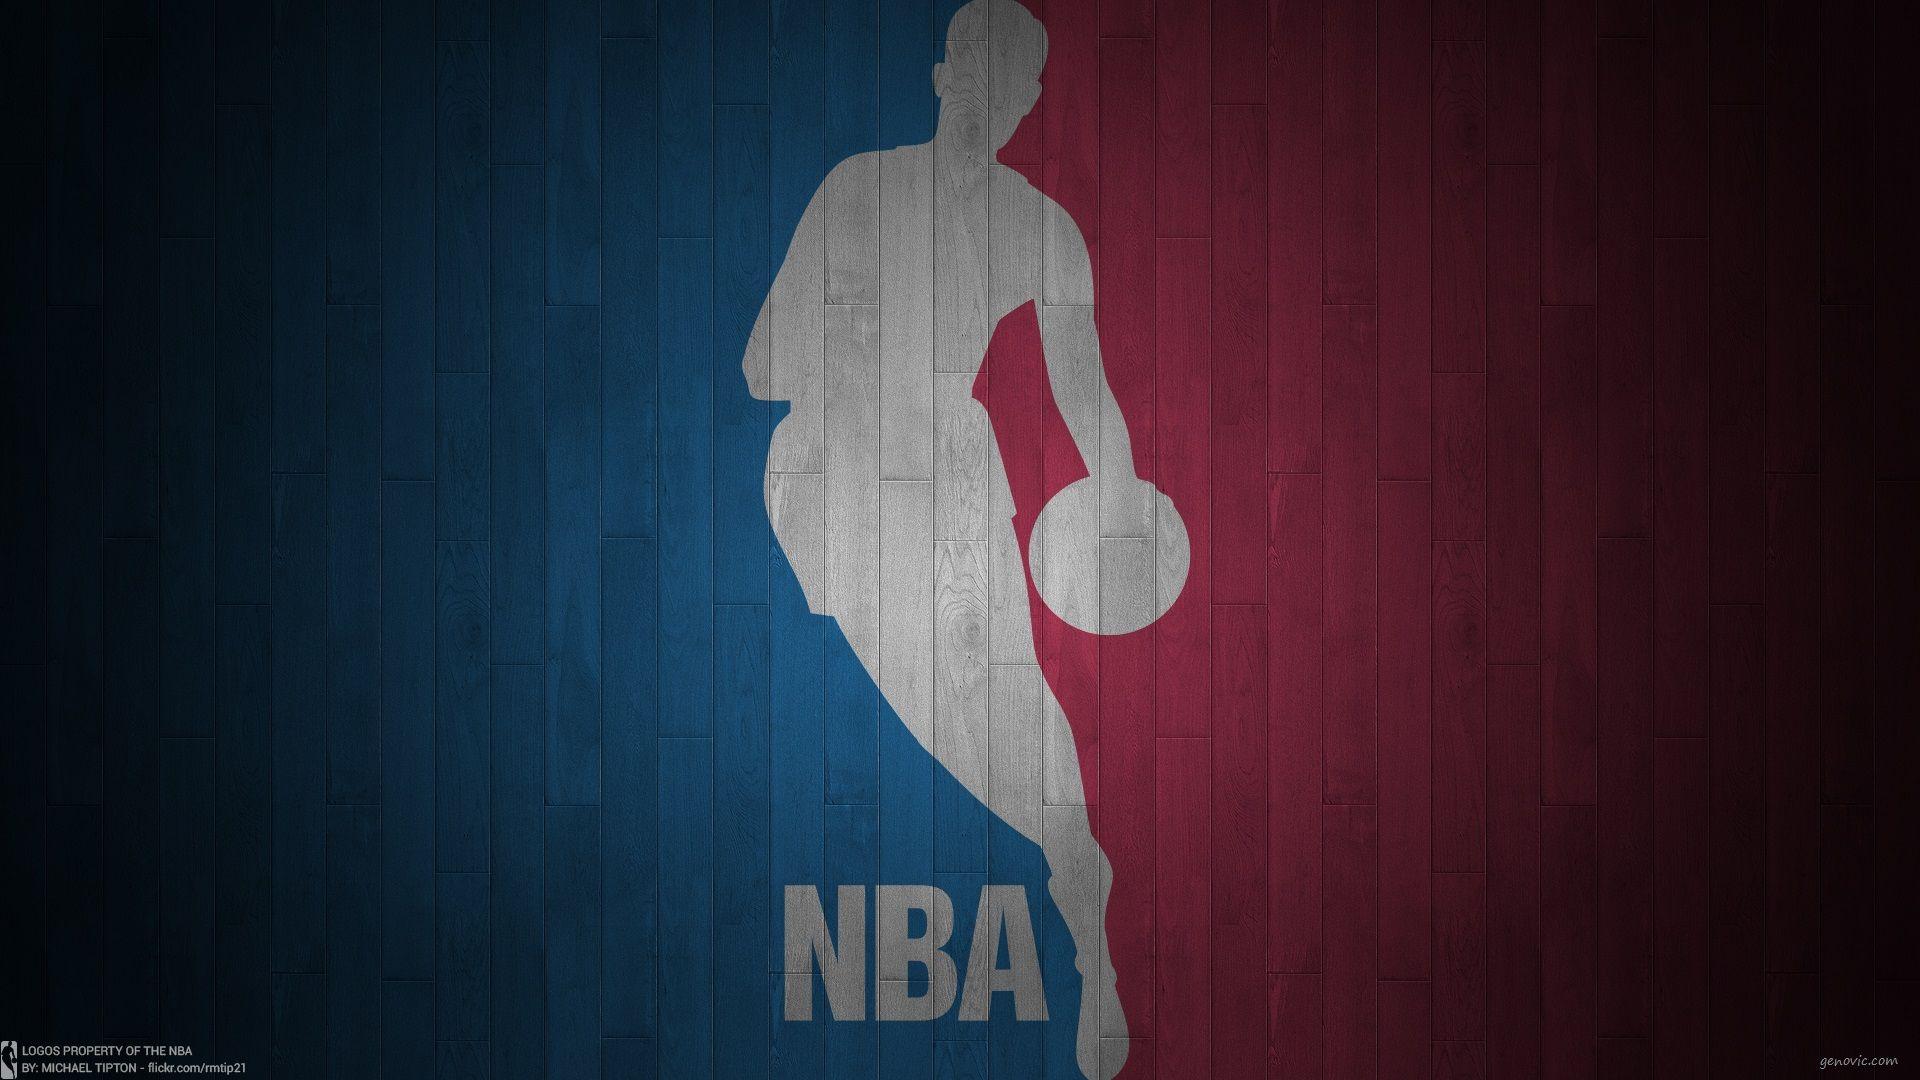 Basketball-NBA-wallpaper-wpc5802514